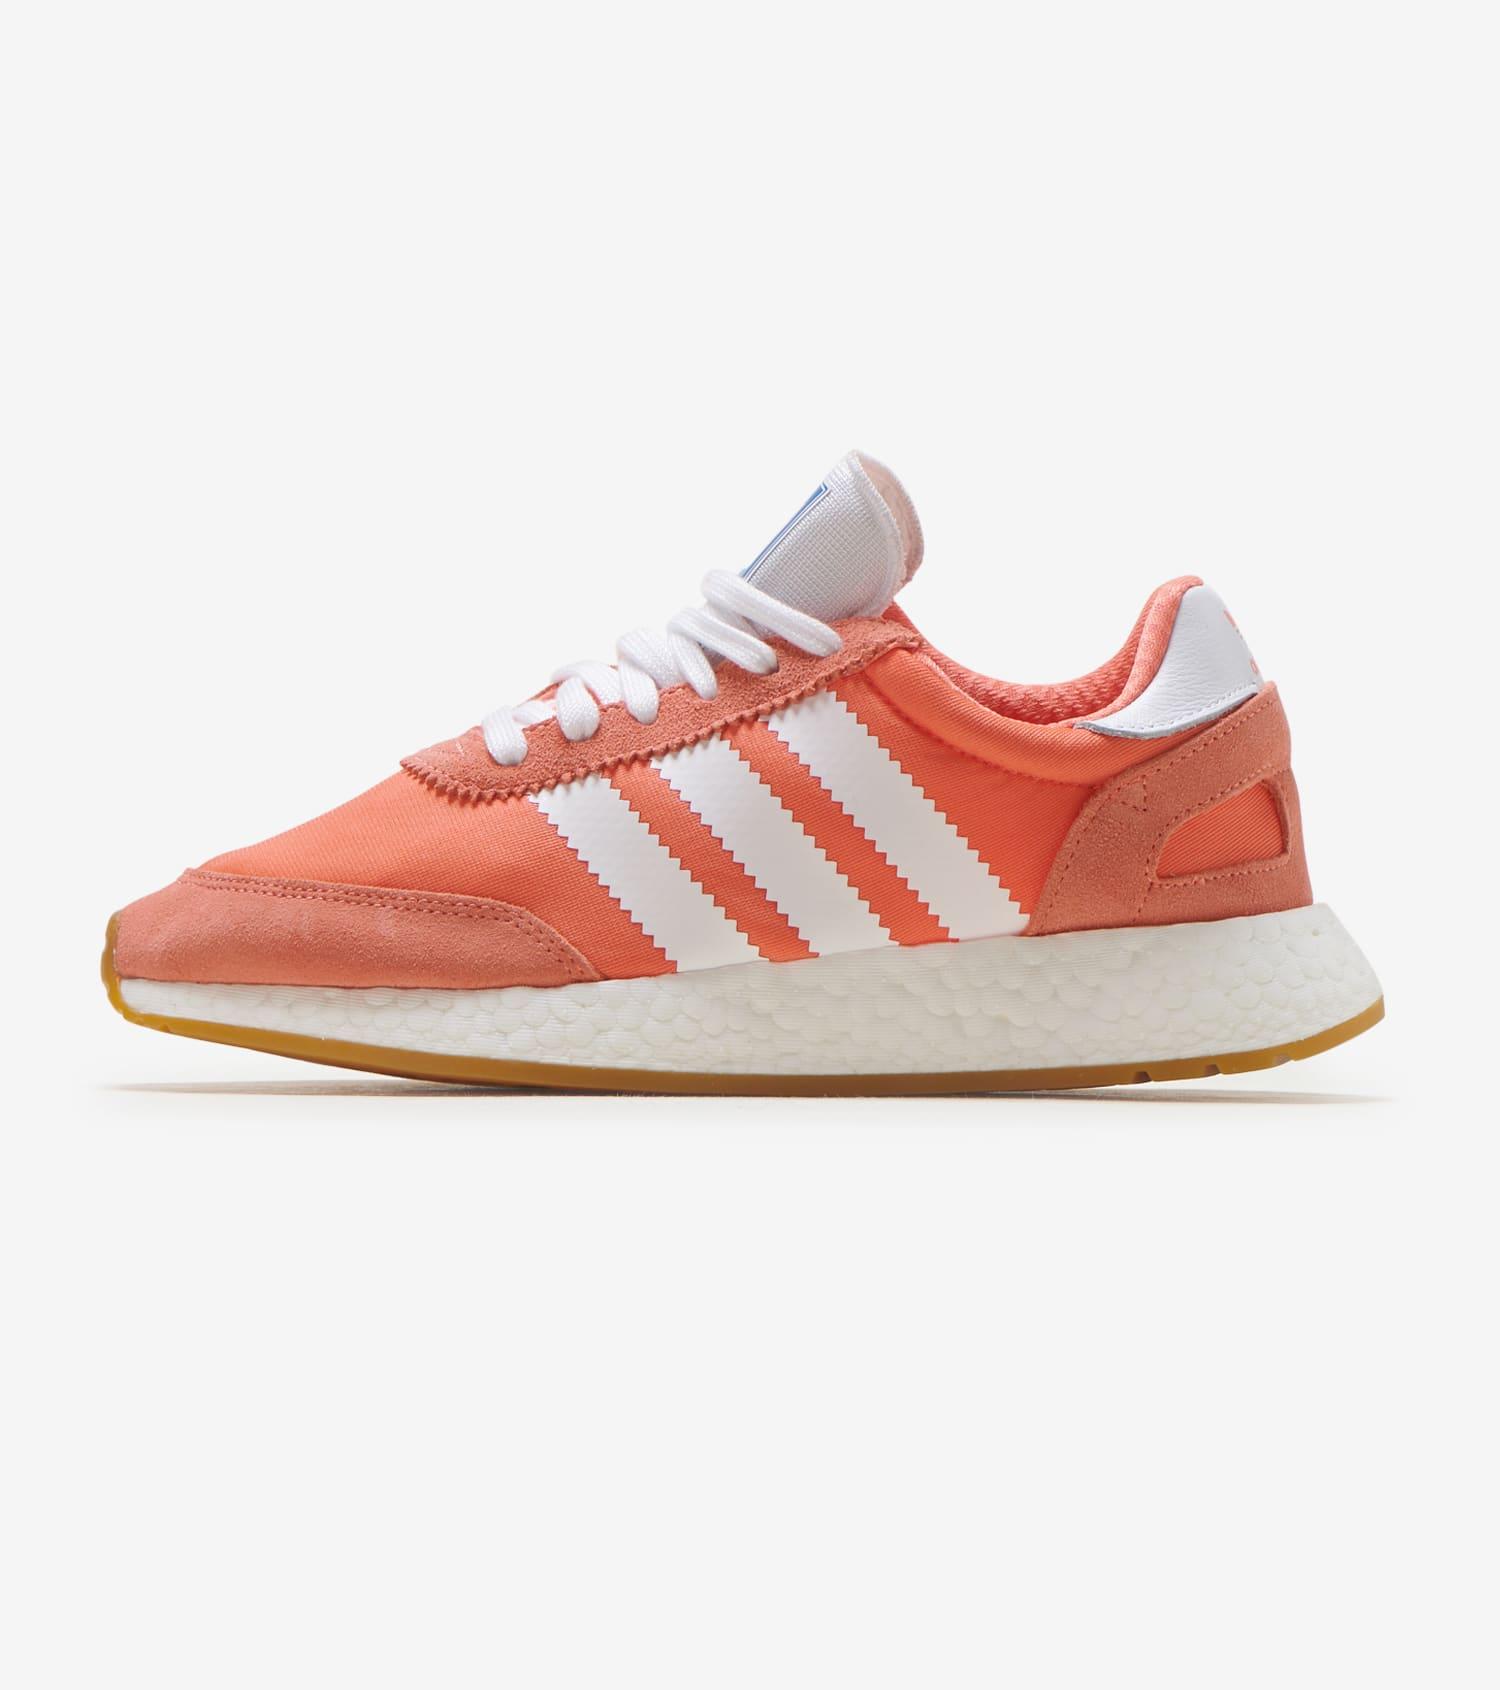 Adidas I 5923 Shoes (Pink) BB6864 | Jimmy Jazz